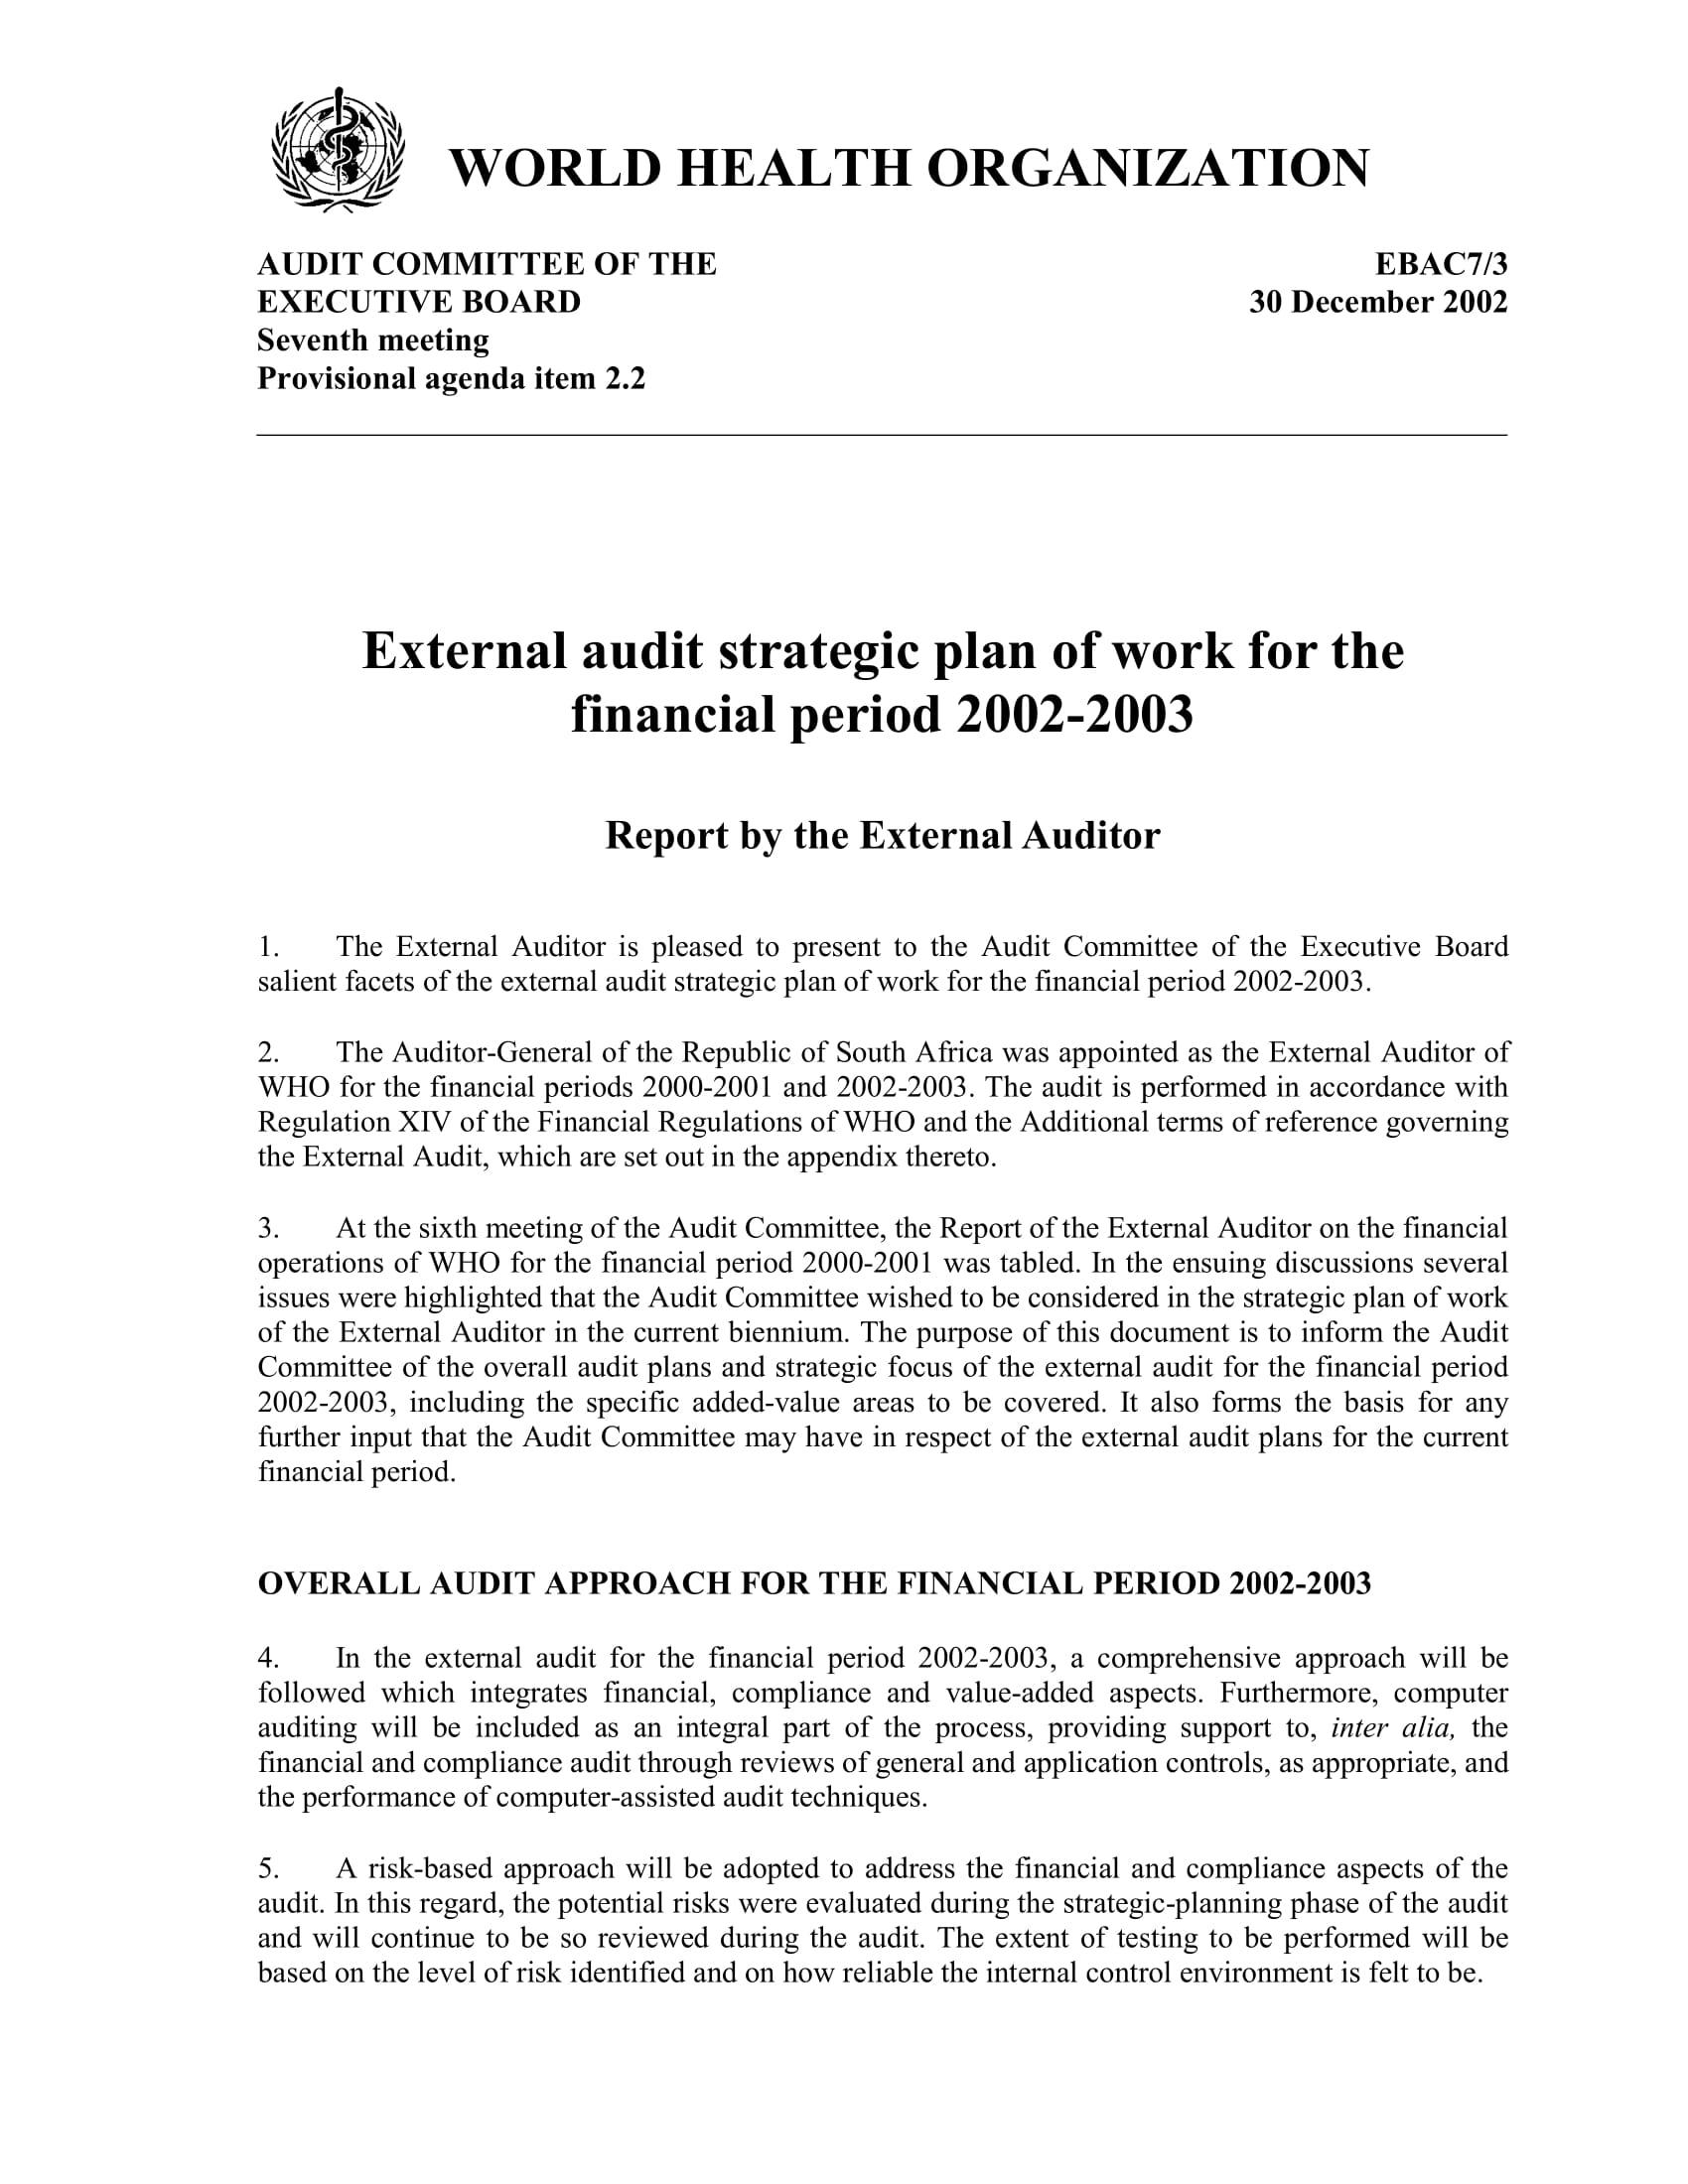 who external audit strategic plan example